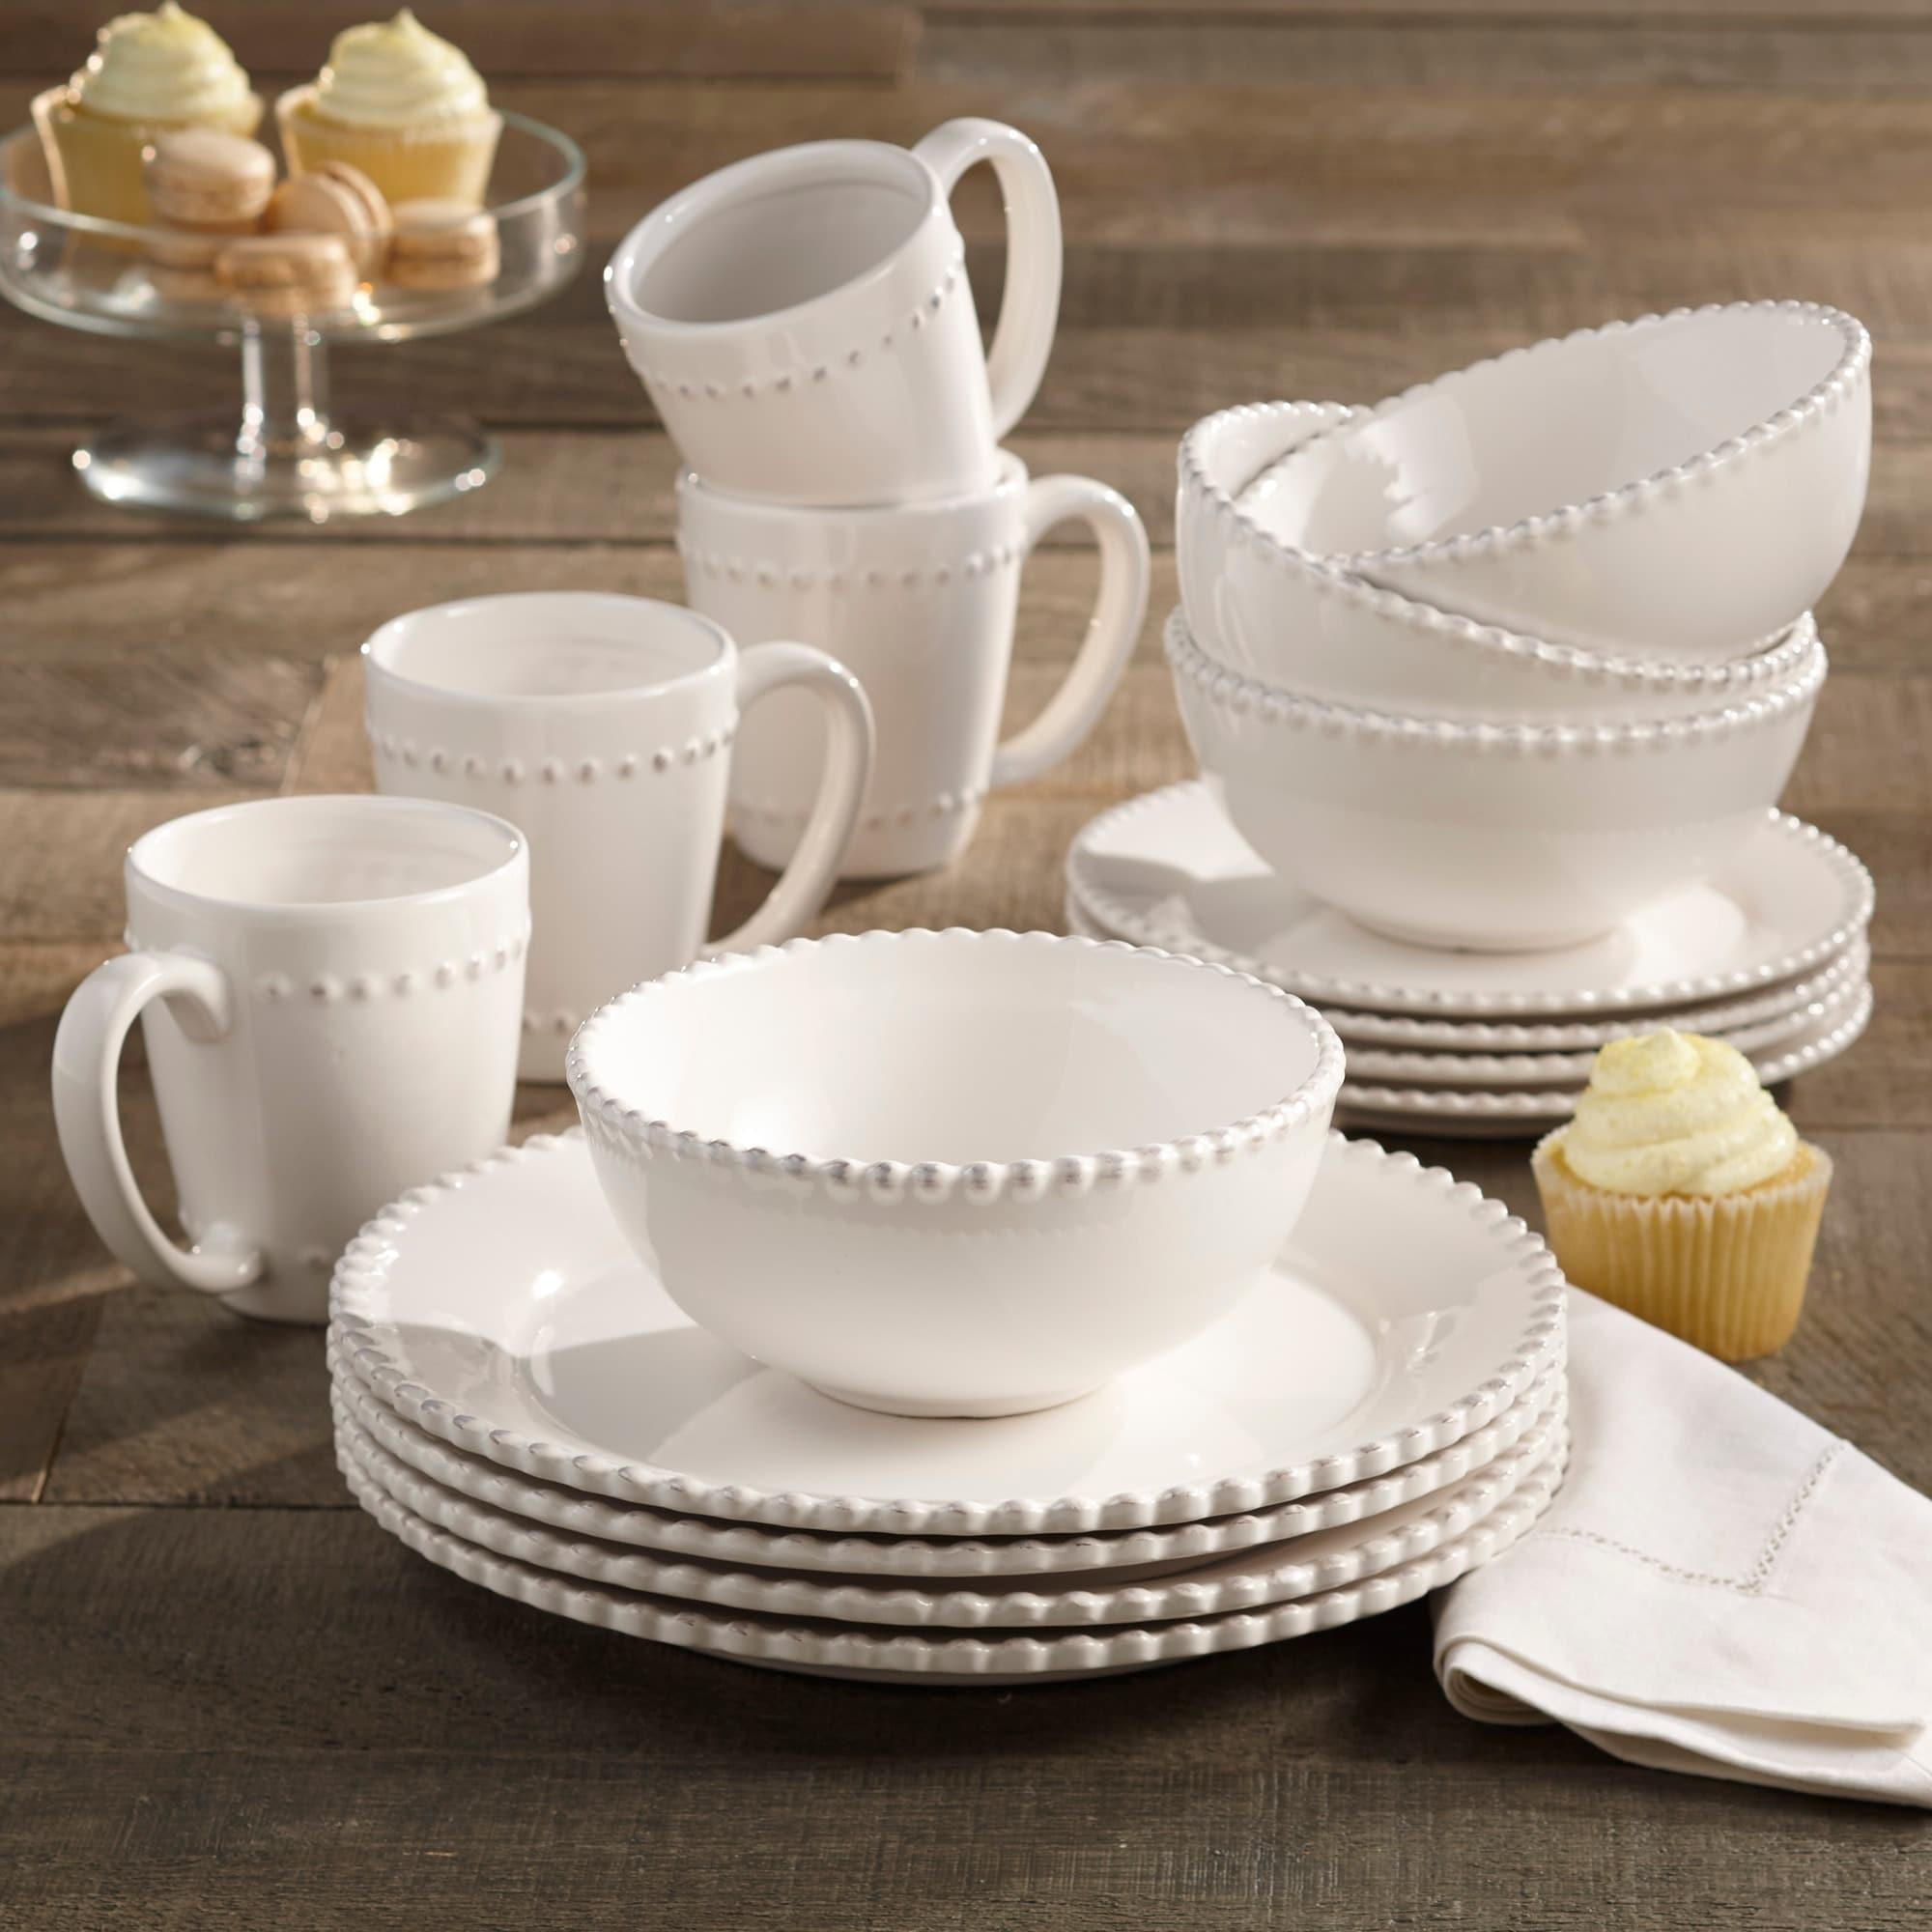 American Atelier Bianca Bead 16-piece Dinnerware Set - Free Shipping Today - Overstock - 13025720 & American Atelier Bianca Bead 16-piece Dinnerware Set - Free Shipping ...